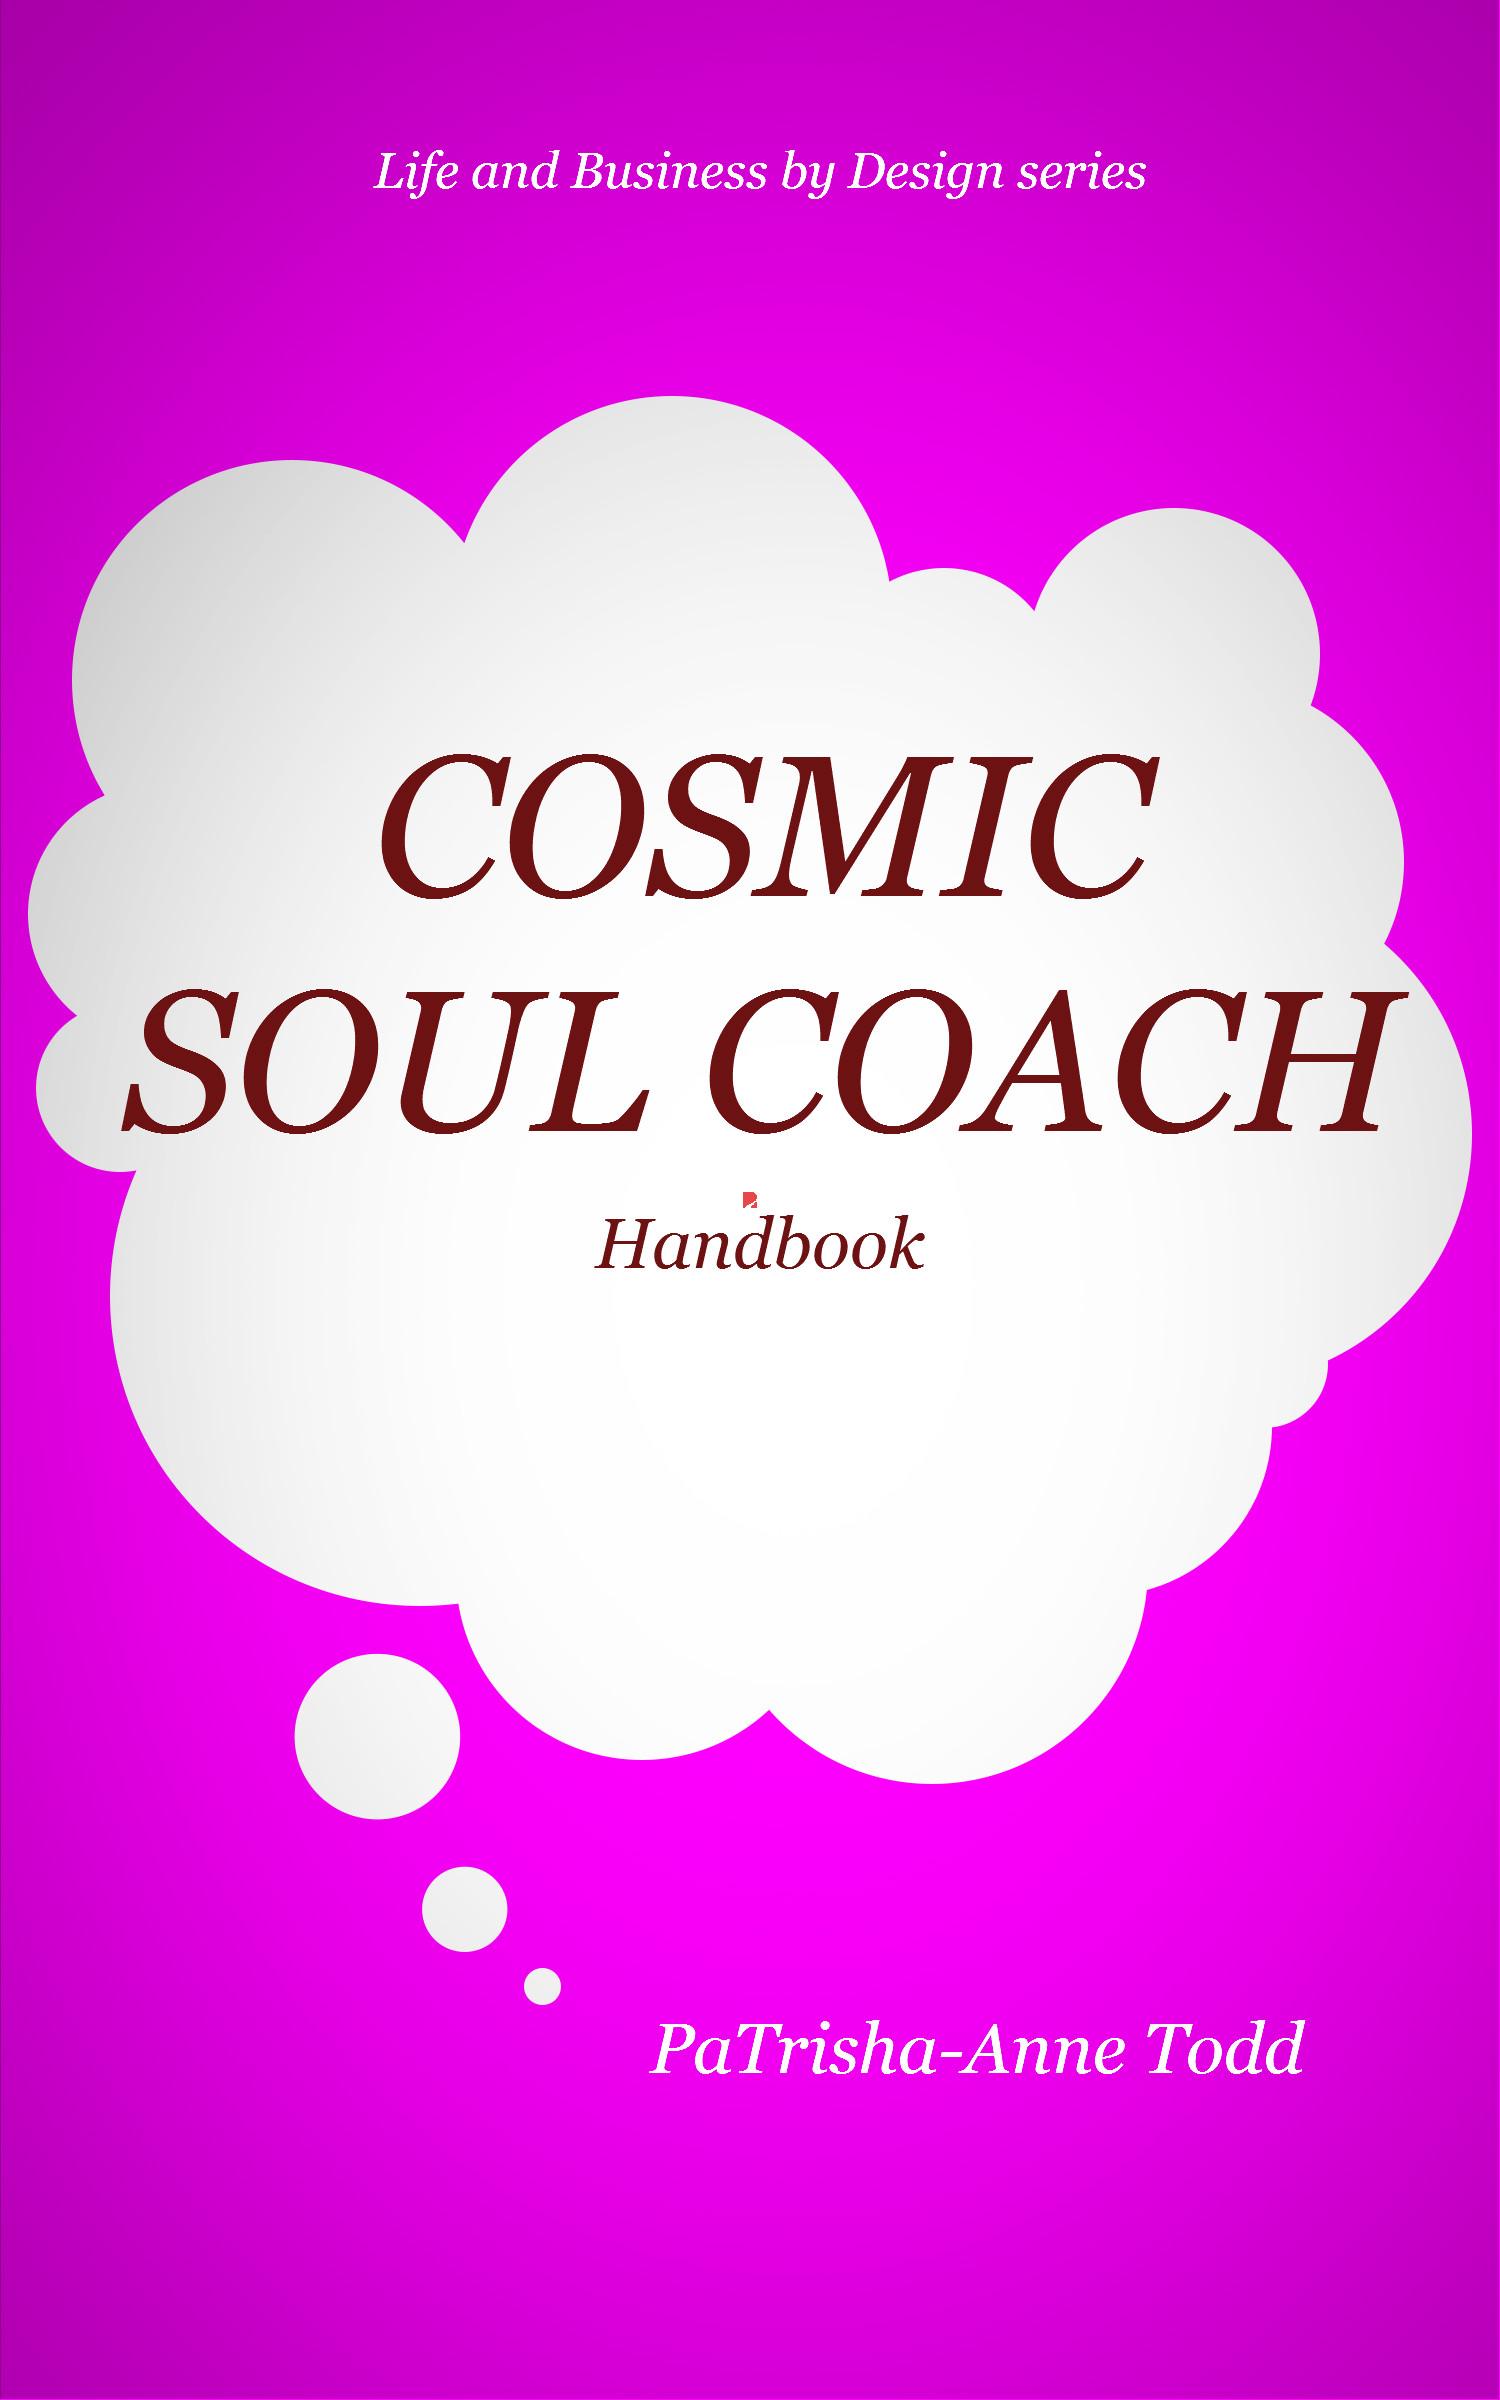 Cosmic Soul Coach Training with Master Cosmic Soul Coach PaTrisha-Anne Todd